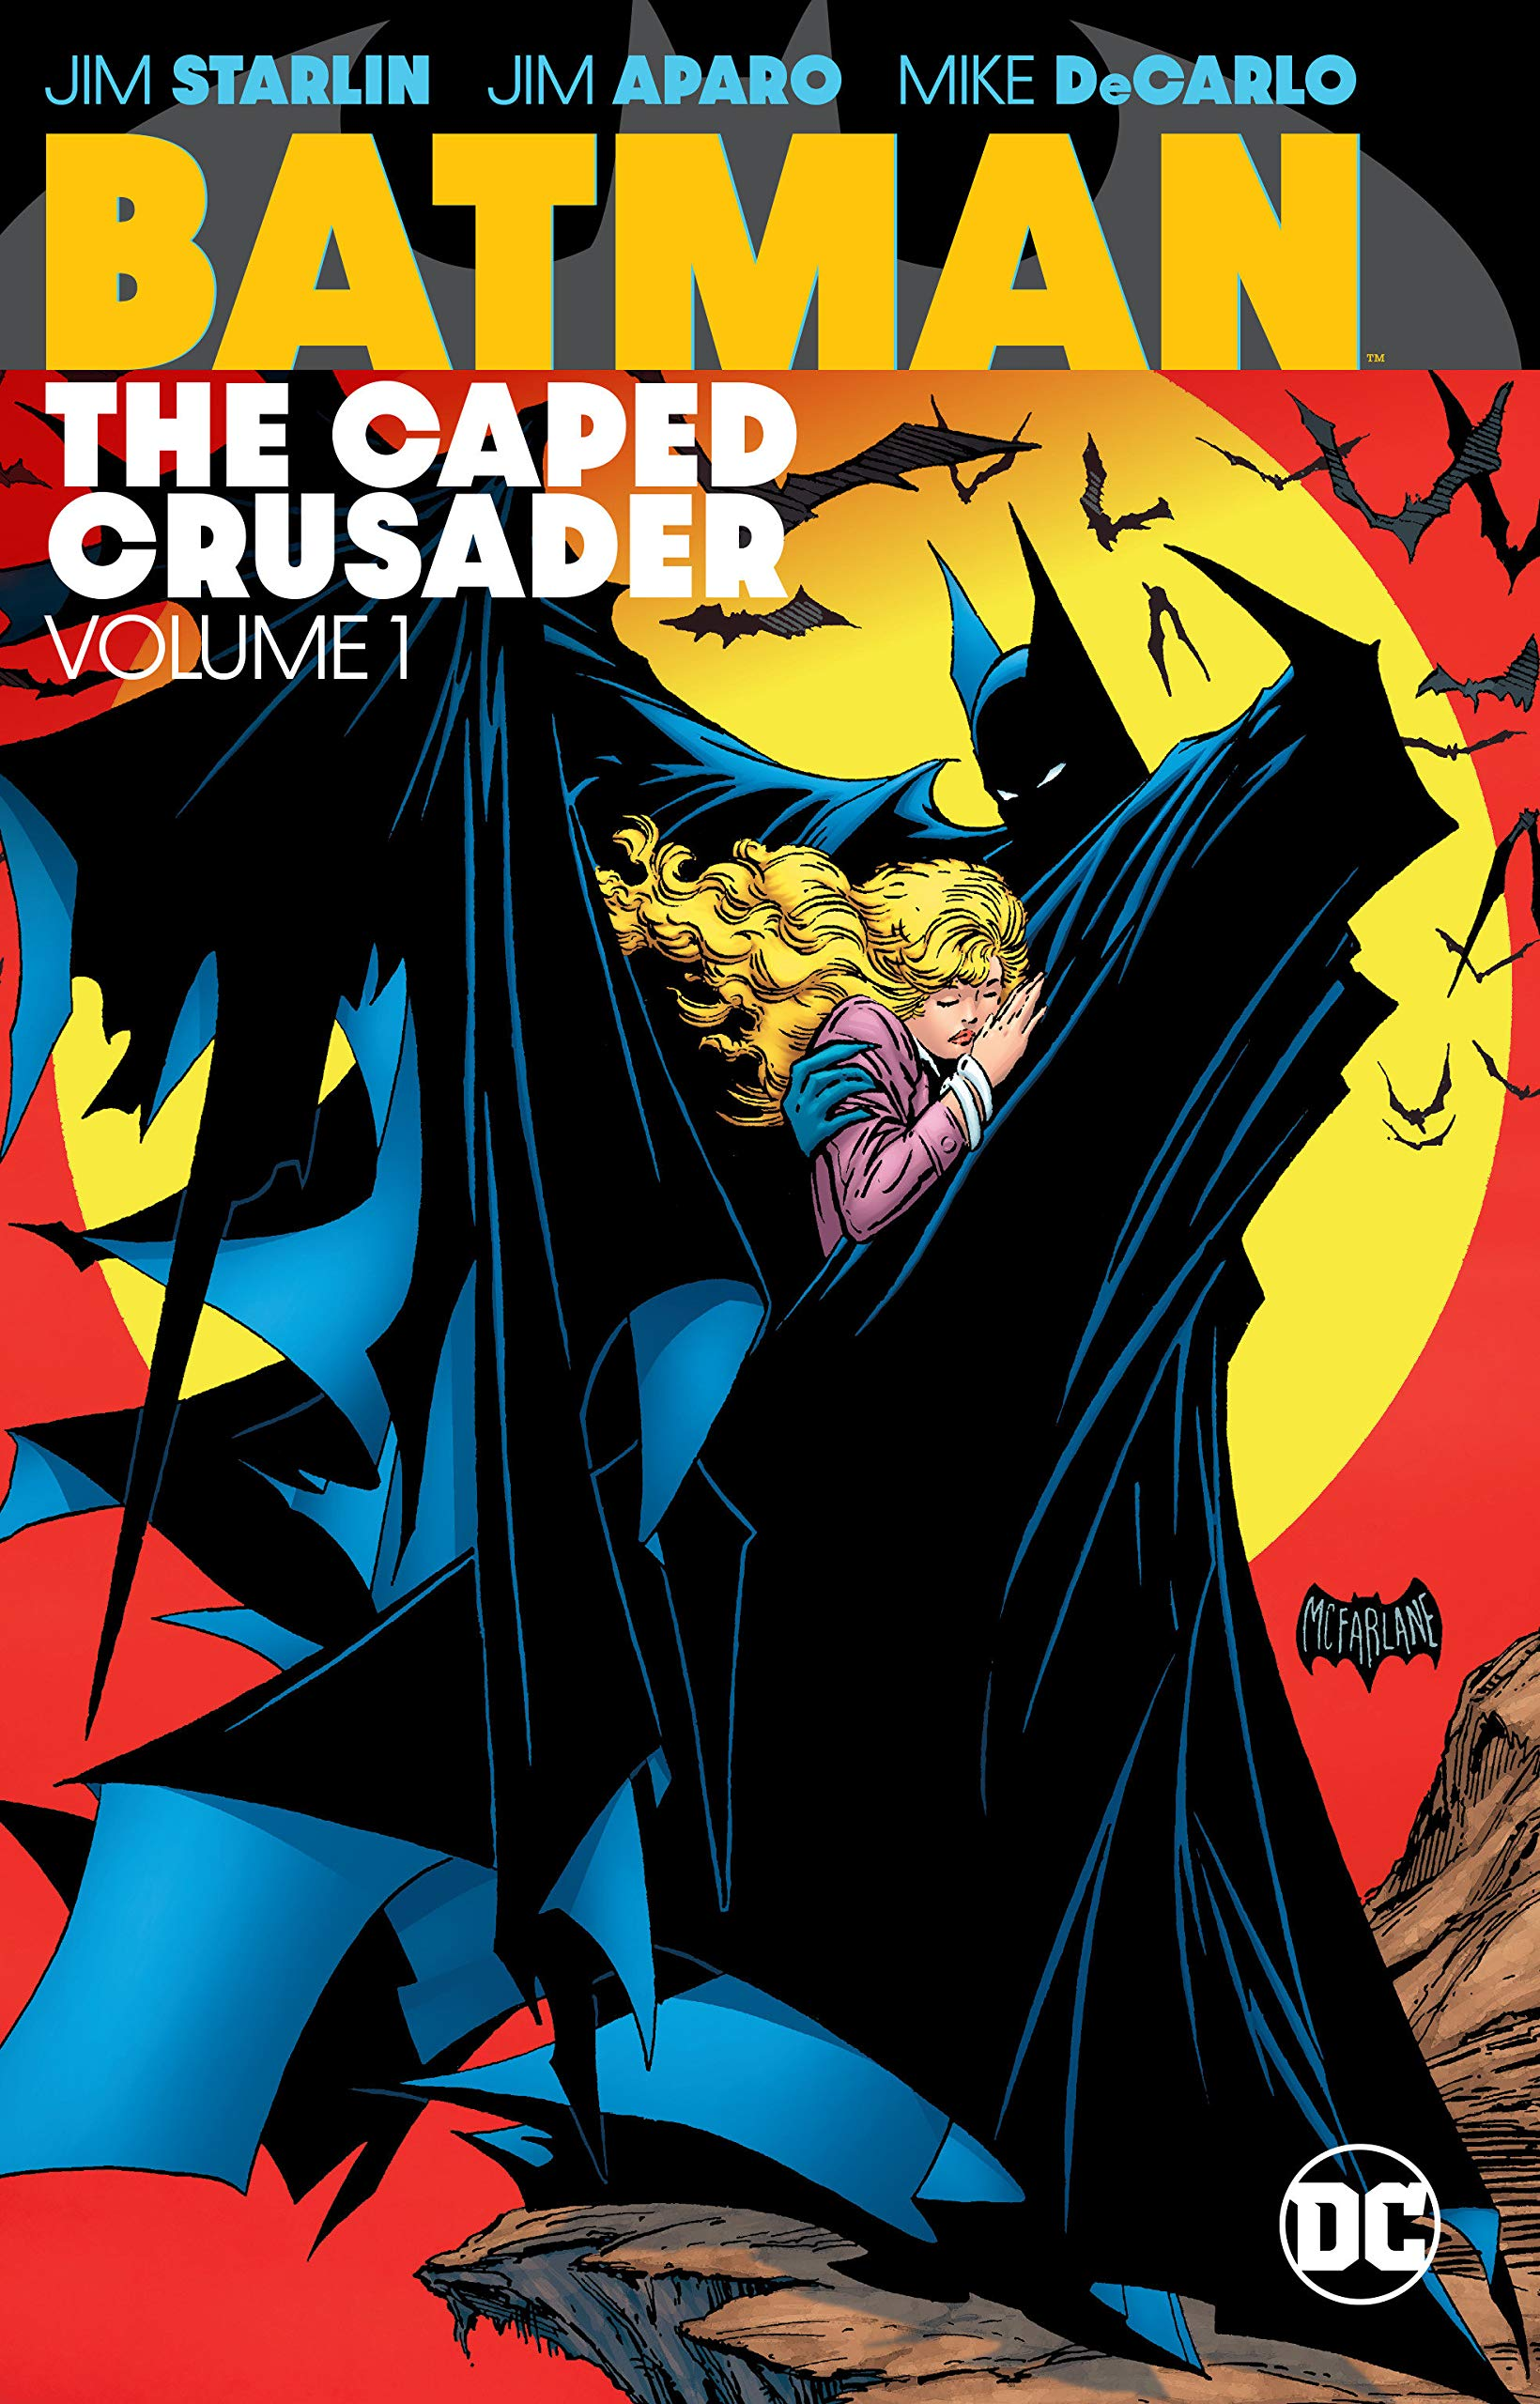 Batman: The Caped Crusader Vol. 1 (Collected)